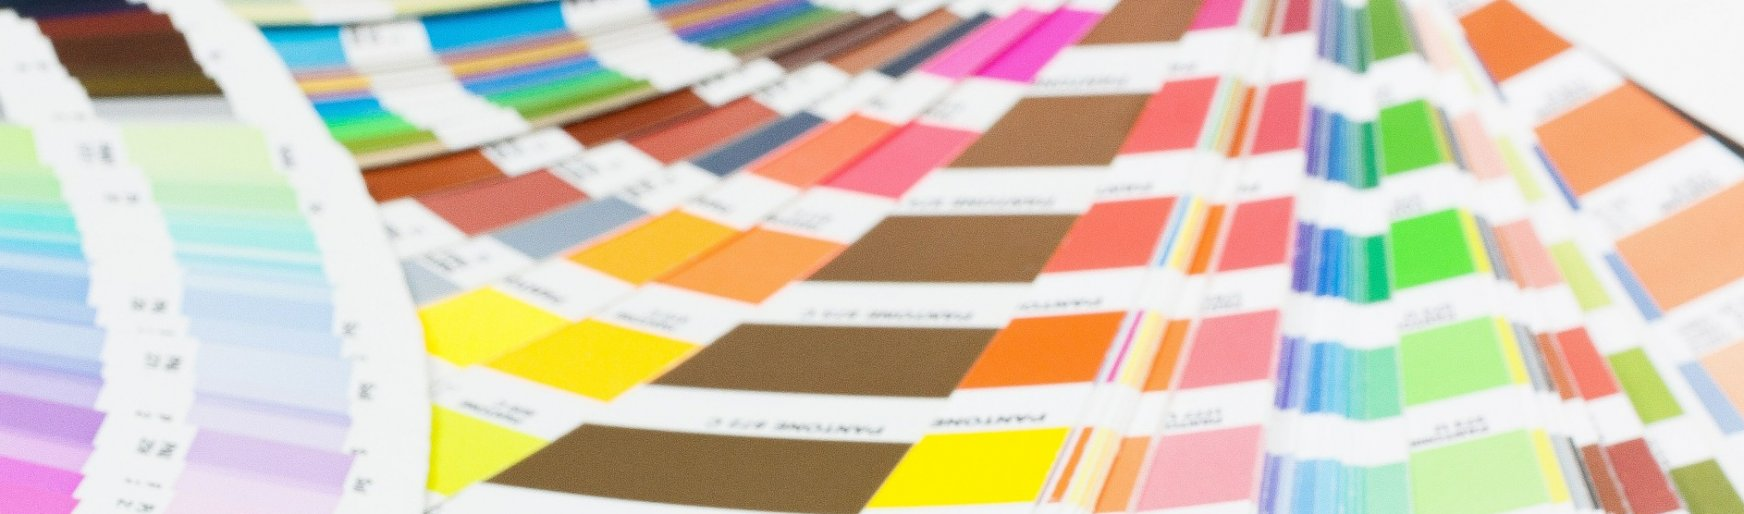 contact styliste tarifs mod liste paris designer freelance ind pendante conseils cr ation de. Black Bedroom Furniture Sets. Home Design Ideas